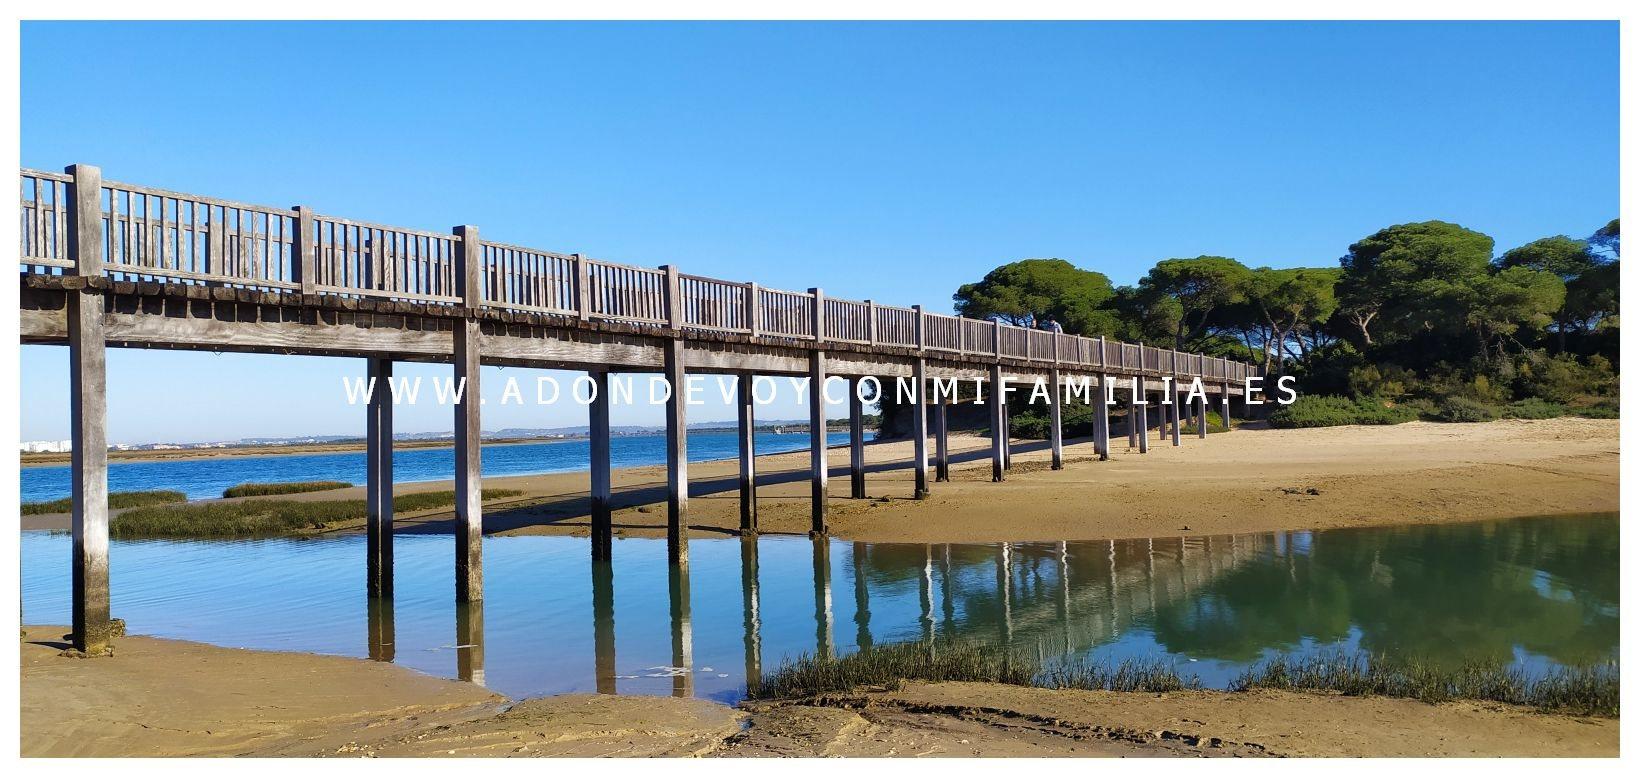 playa-rio-san-pedro-Adondevoyconmifamilia-01